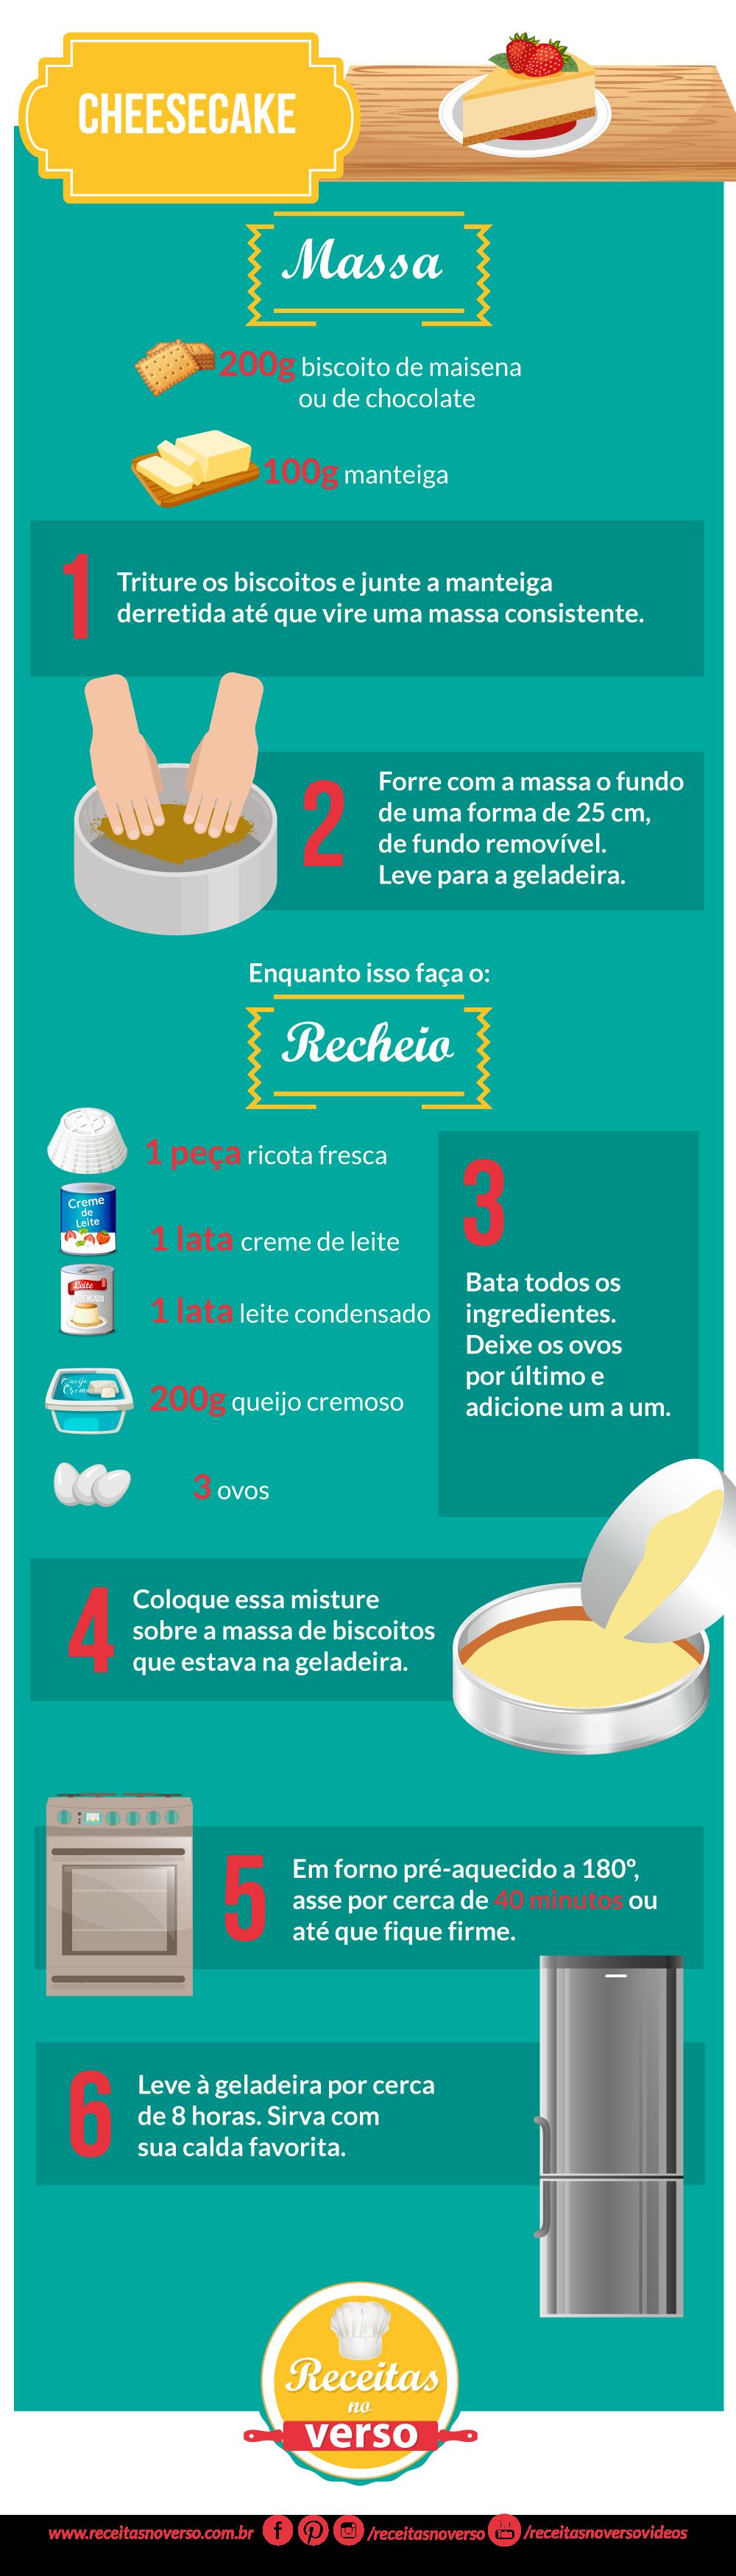 cheeseacake_infografico